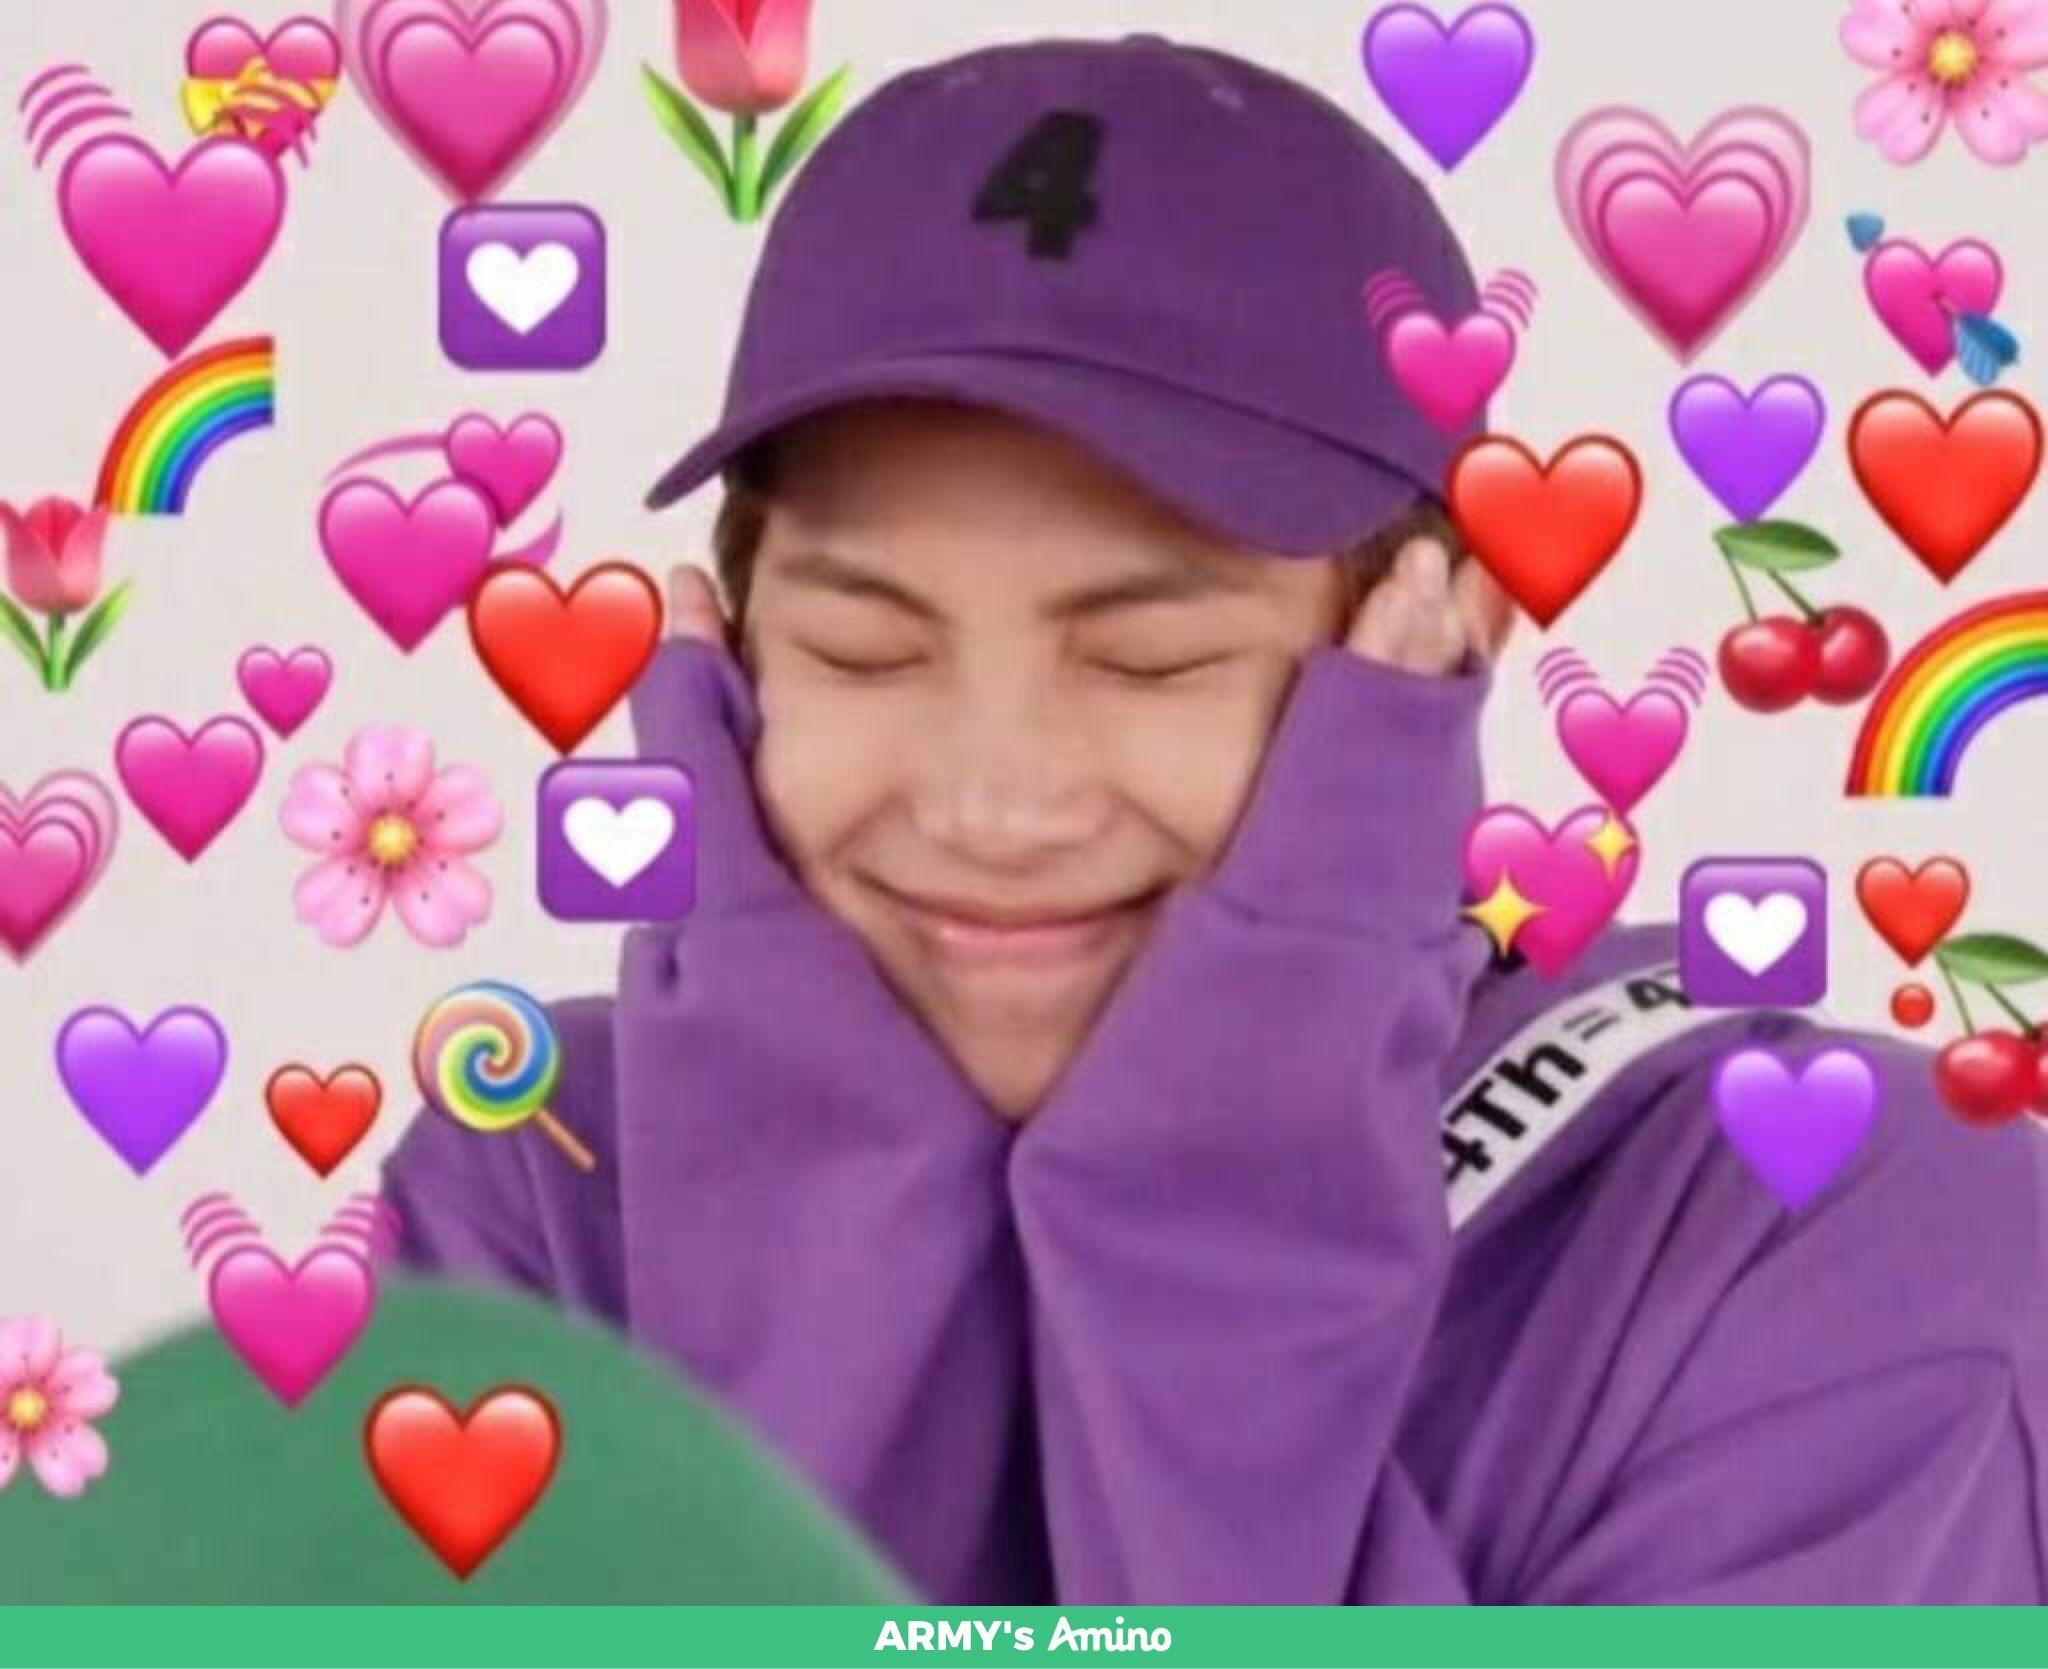 Pin By Tata On Bts Heartu Bts Meme Faces Bts Emoji Heart Meme